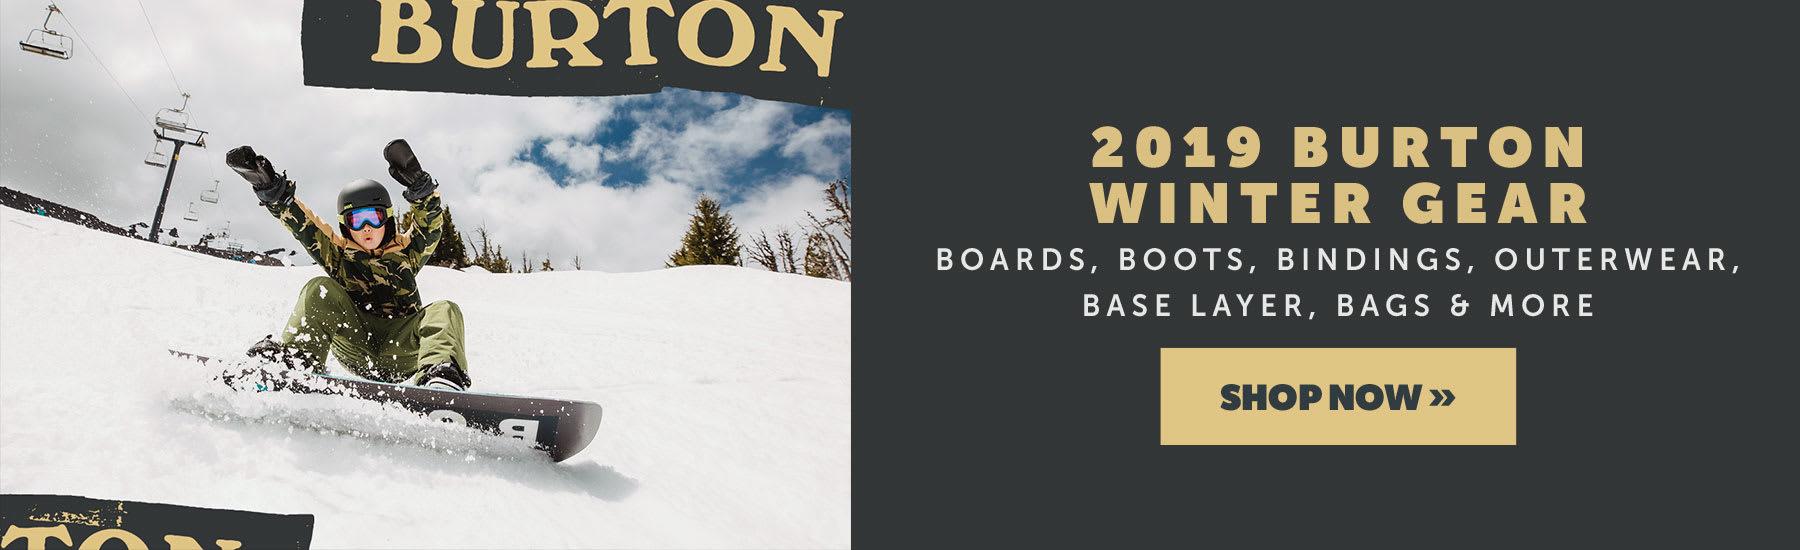 2019 Burton